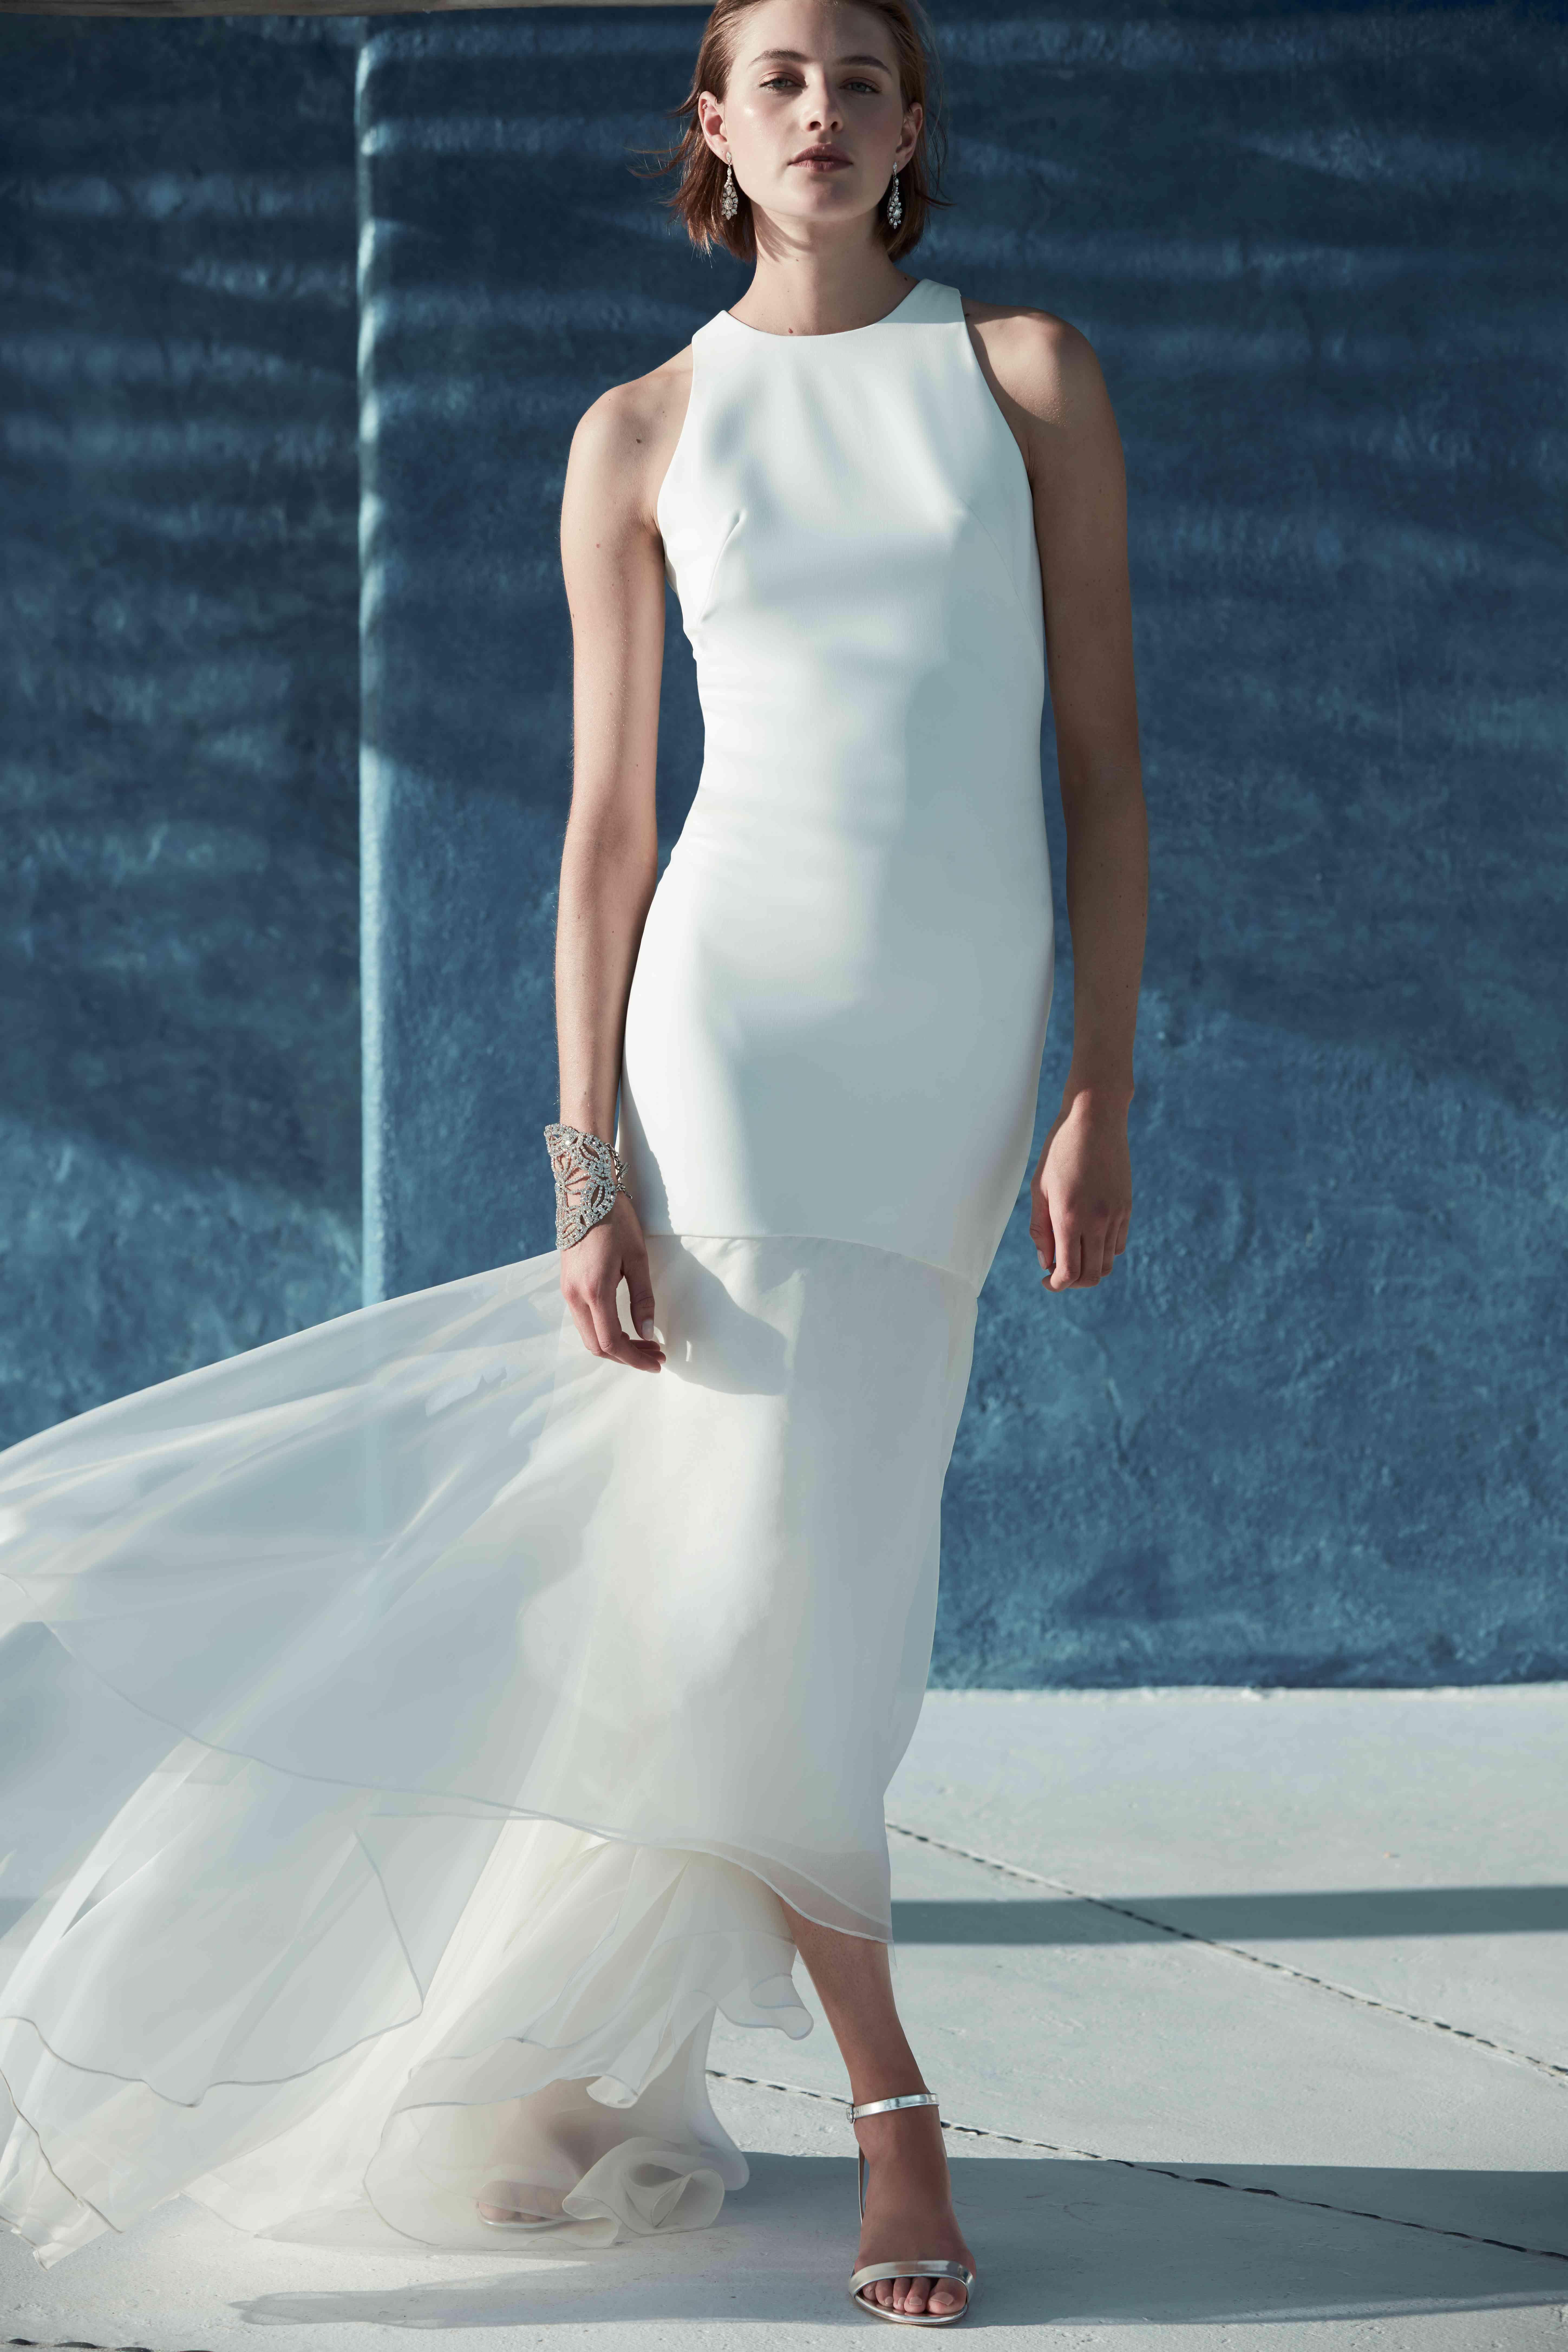 11 Minimalist Wedding Dresses That Will Make Your 90s